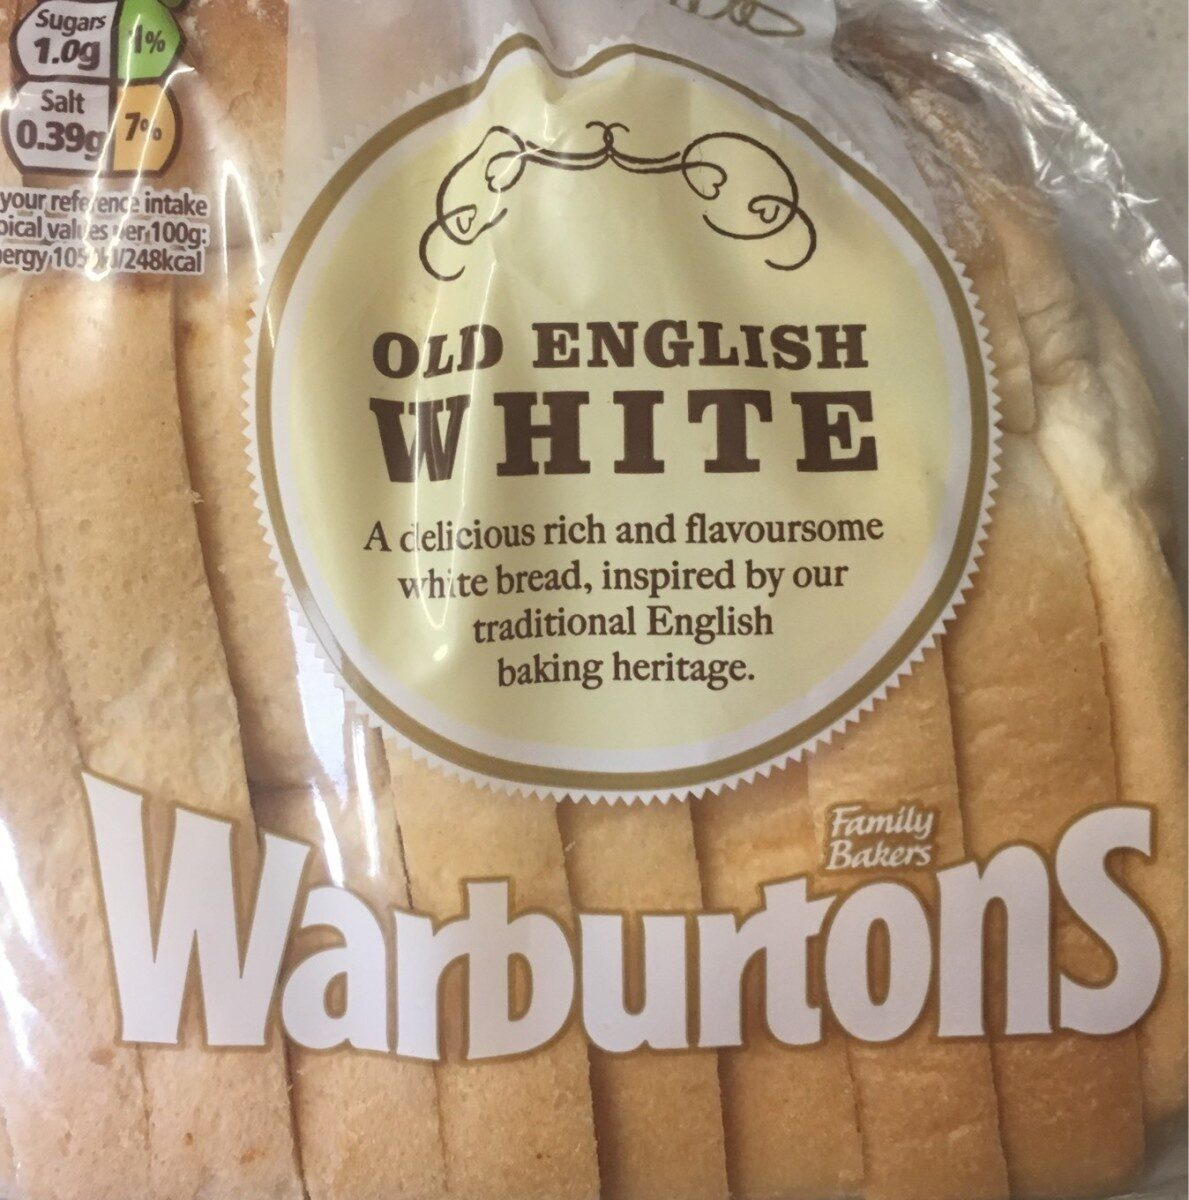 Warburtons Old English Medium Sliced White Bread 400G - Product - en